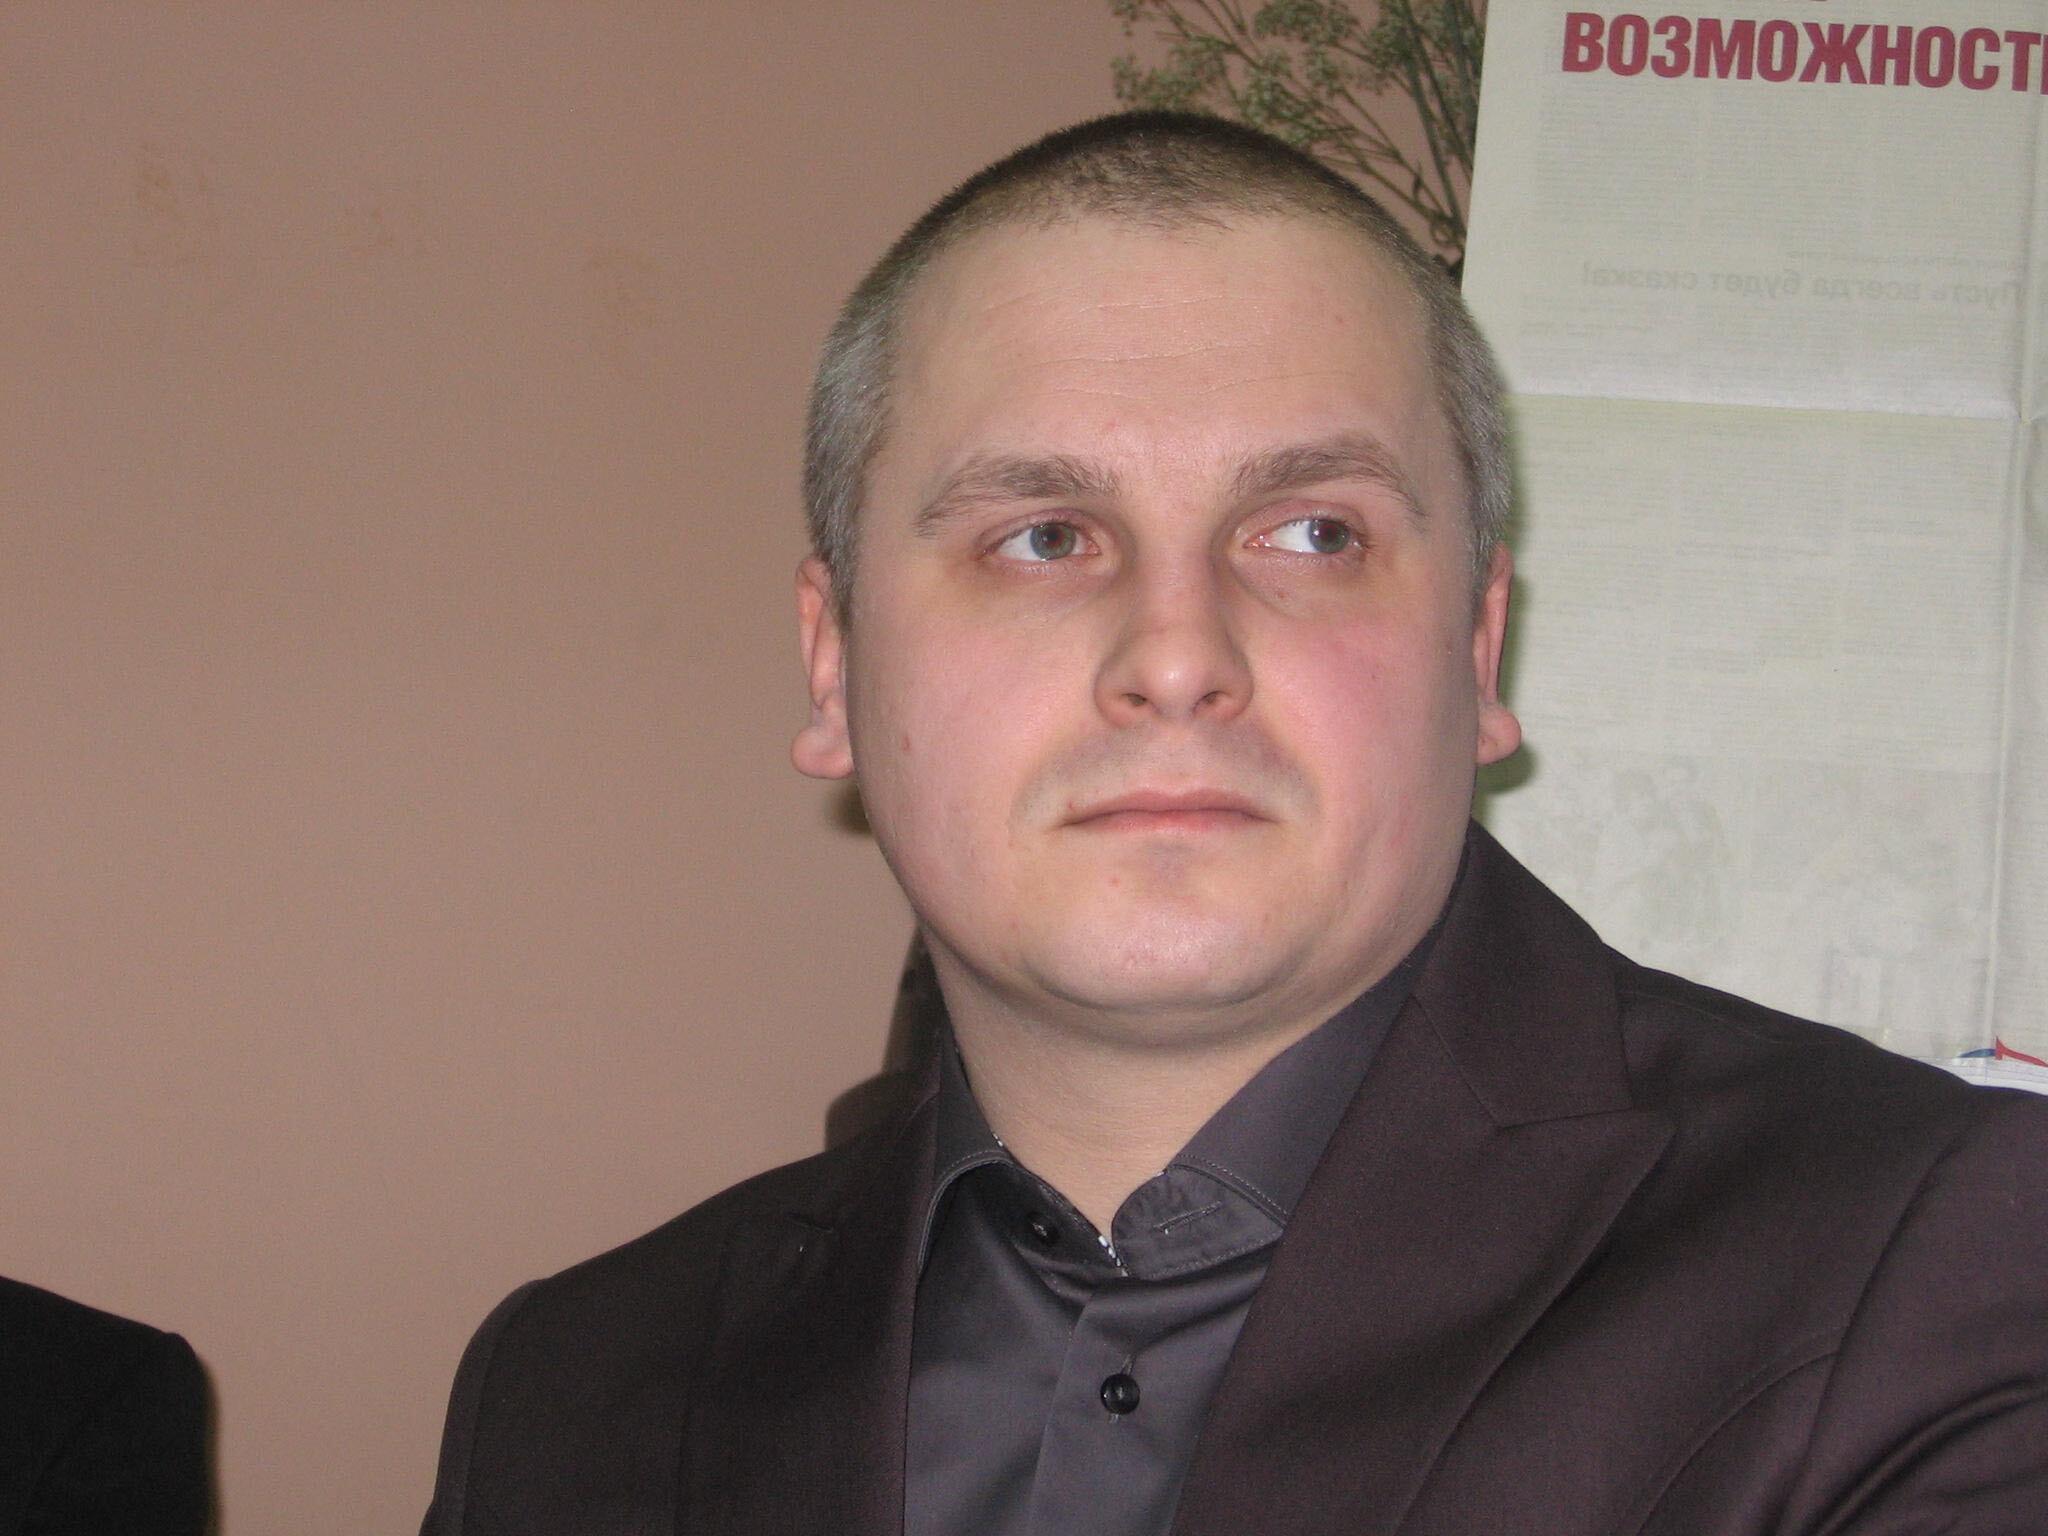 Дмитрий Динзе адвокат Леонида Николаева